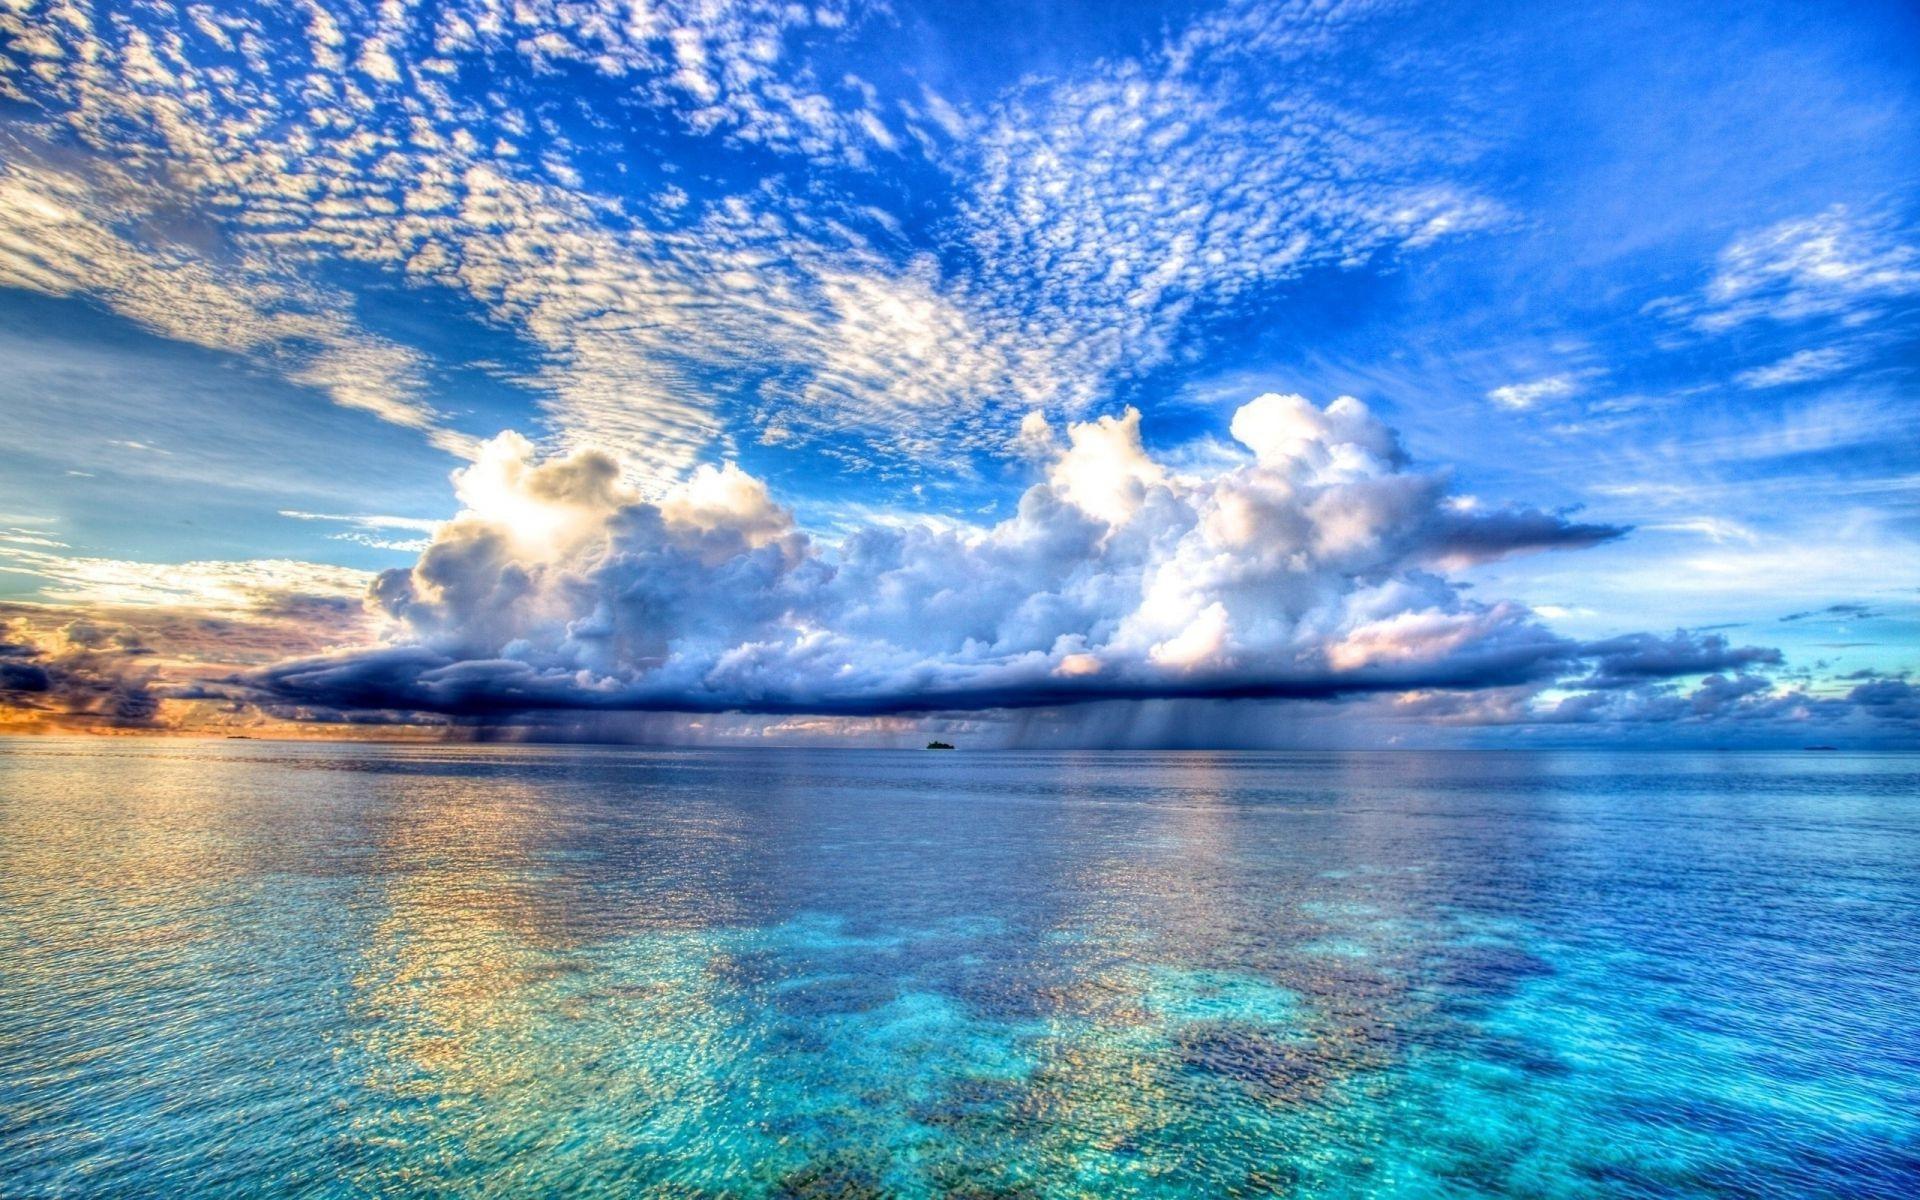 Sea And Ocean Water Sky Summer Landscape Nature Sea - Landscape Wallpaper Water - HD Wallpaper